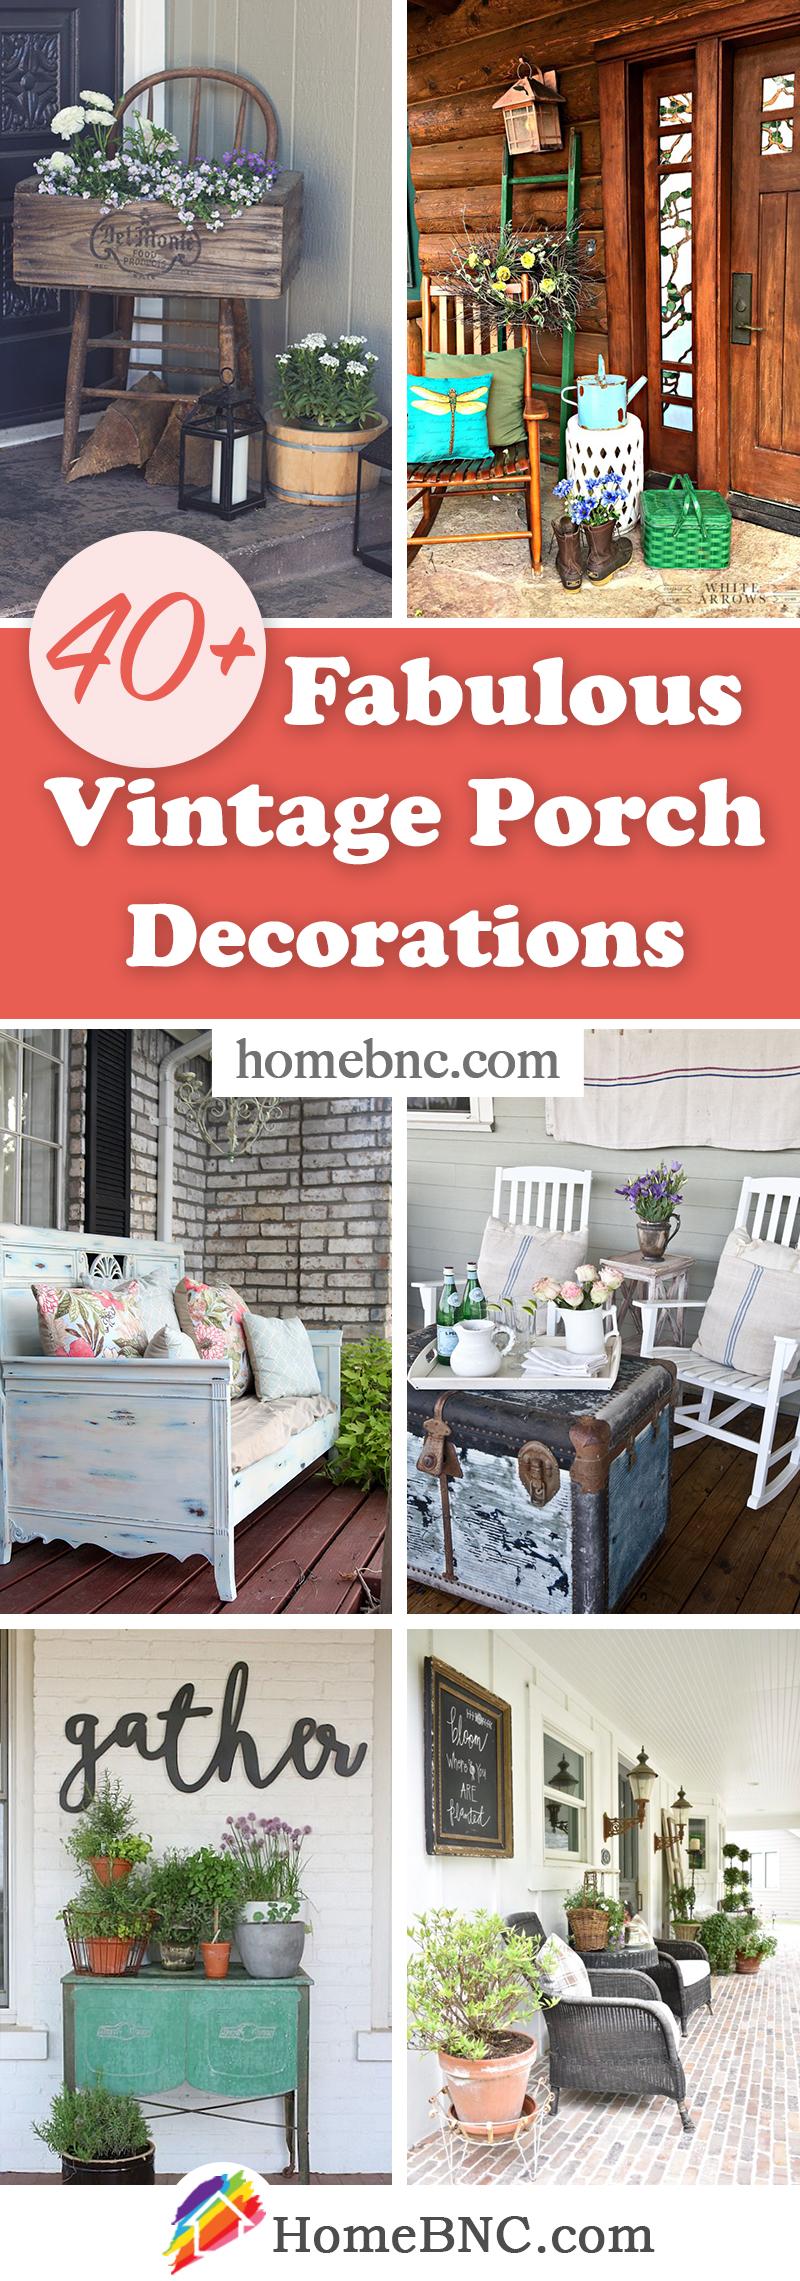 Vintage Porch Decor Ideas